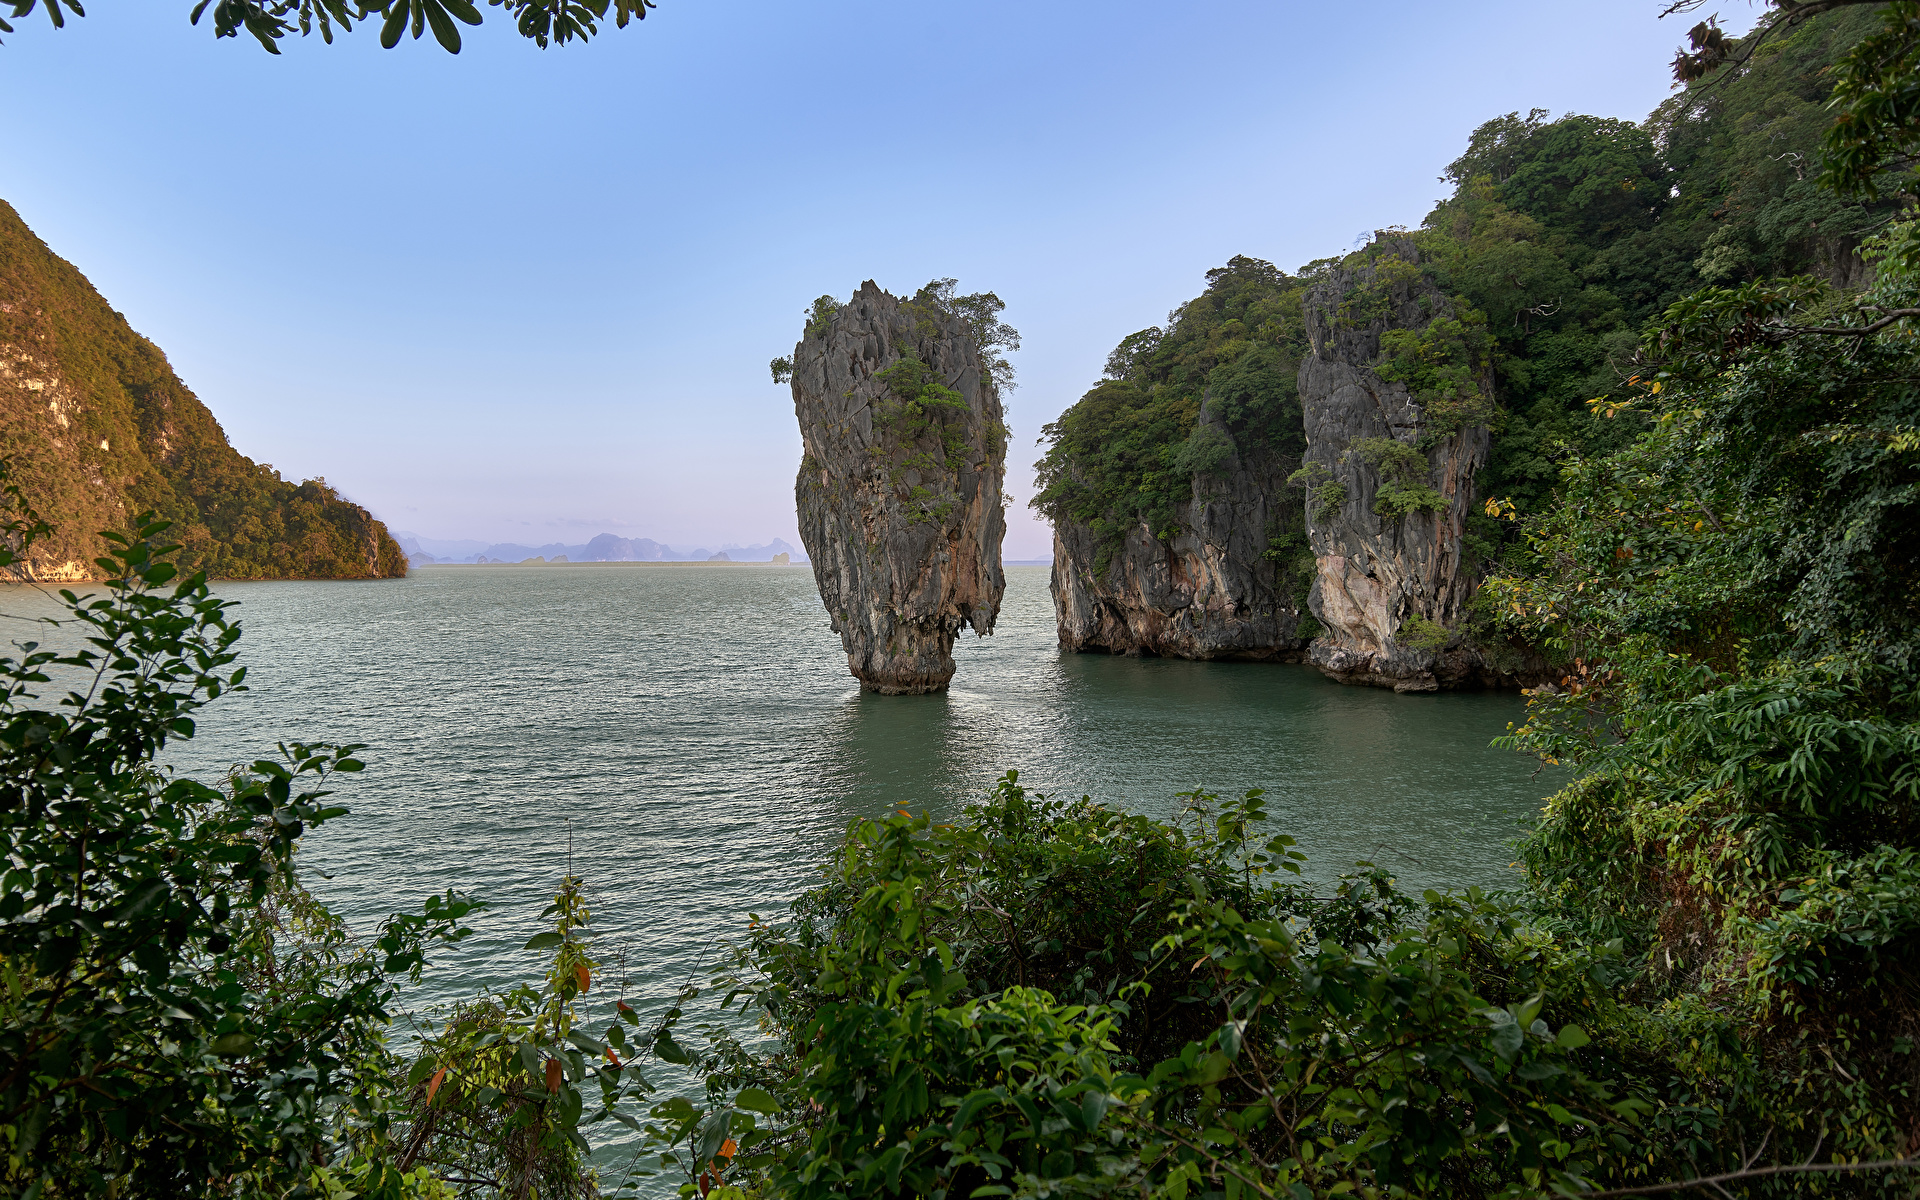 Фотография Таиланд Khao Phing Kan скале Природа Парки Залив 1920x1200 Утес Скала скалы парк залива заливы